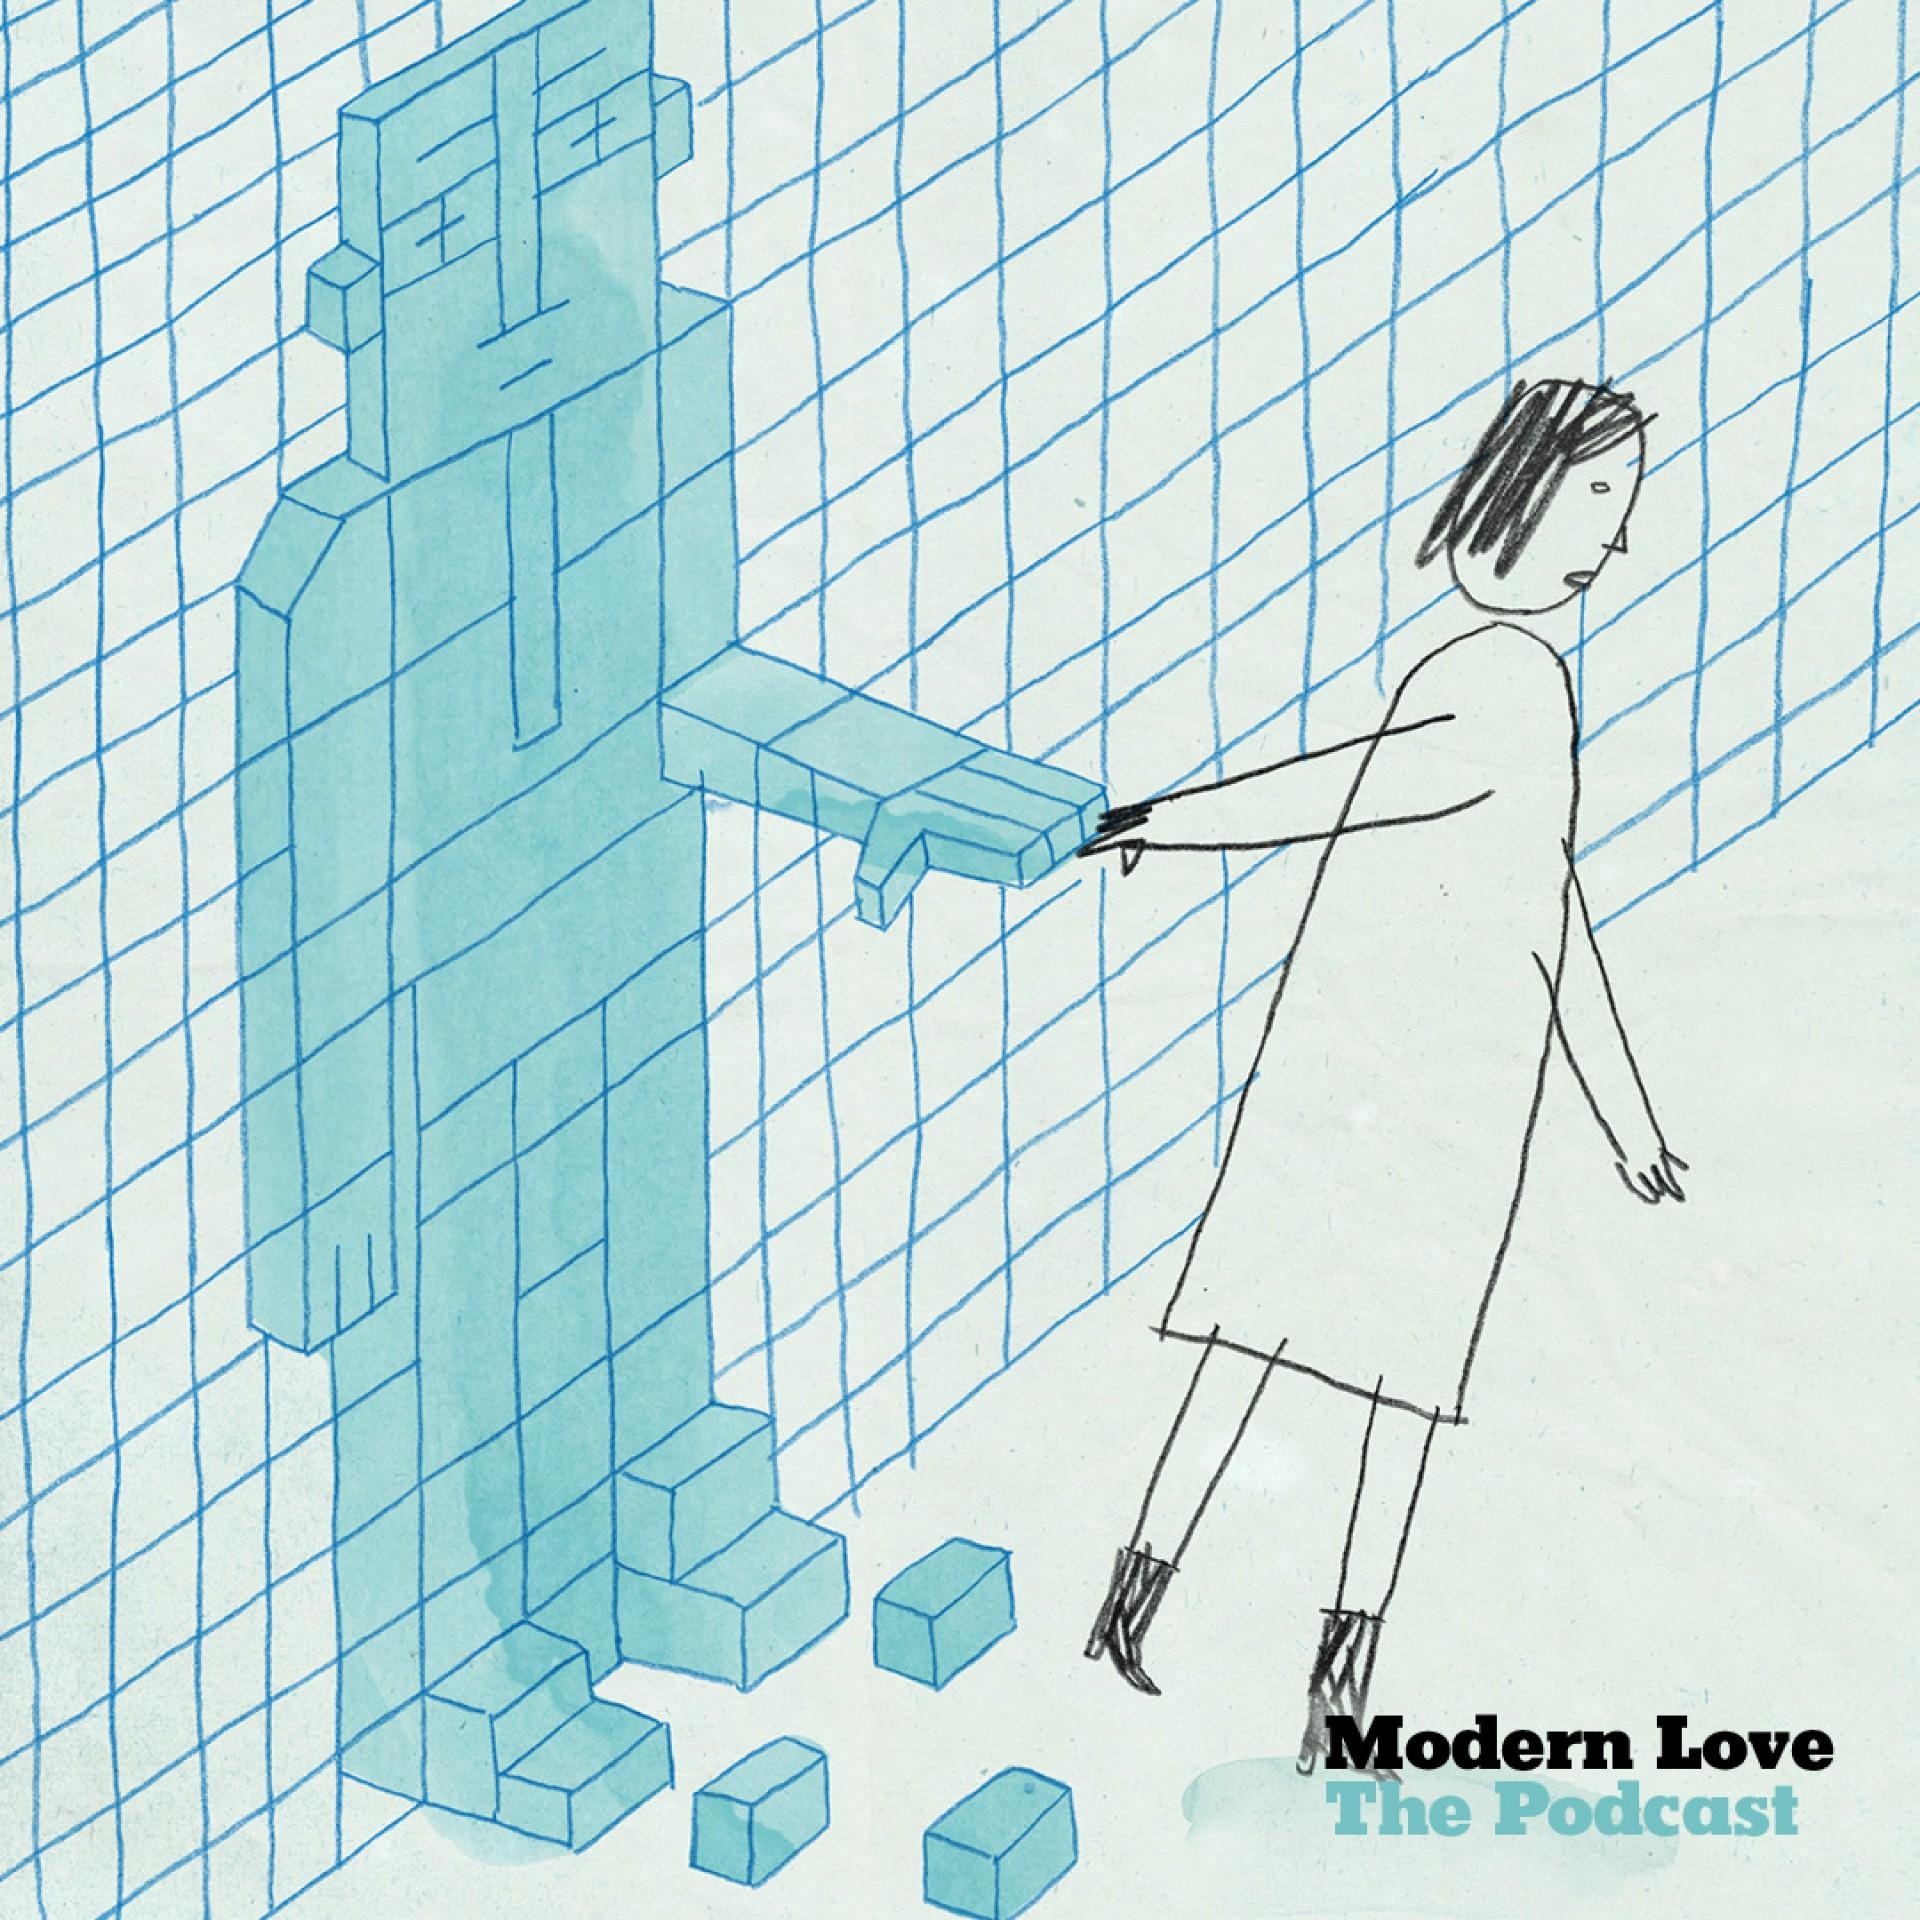 017 Modernlove 1080x1080 Instagram Dewey Copy Modern Love Essays Essay Phenomenal Contest Winner Amy Rosenthal 1920